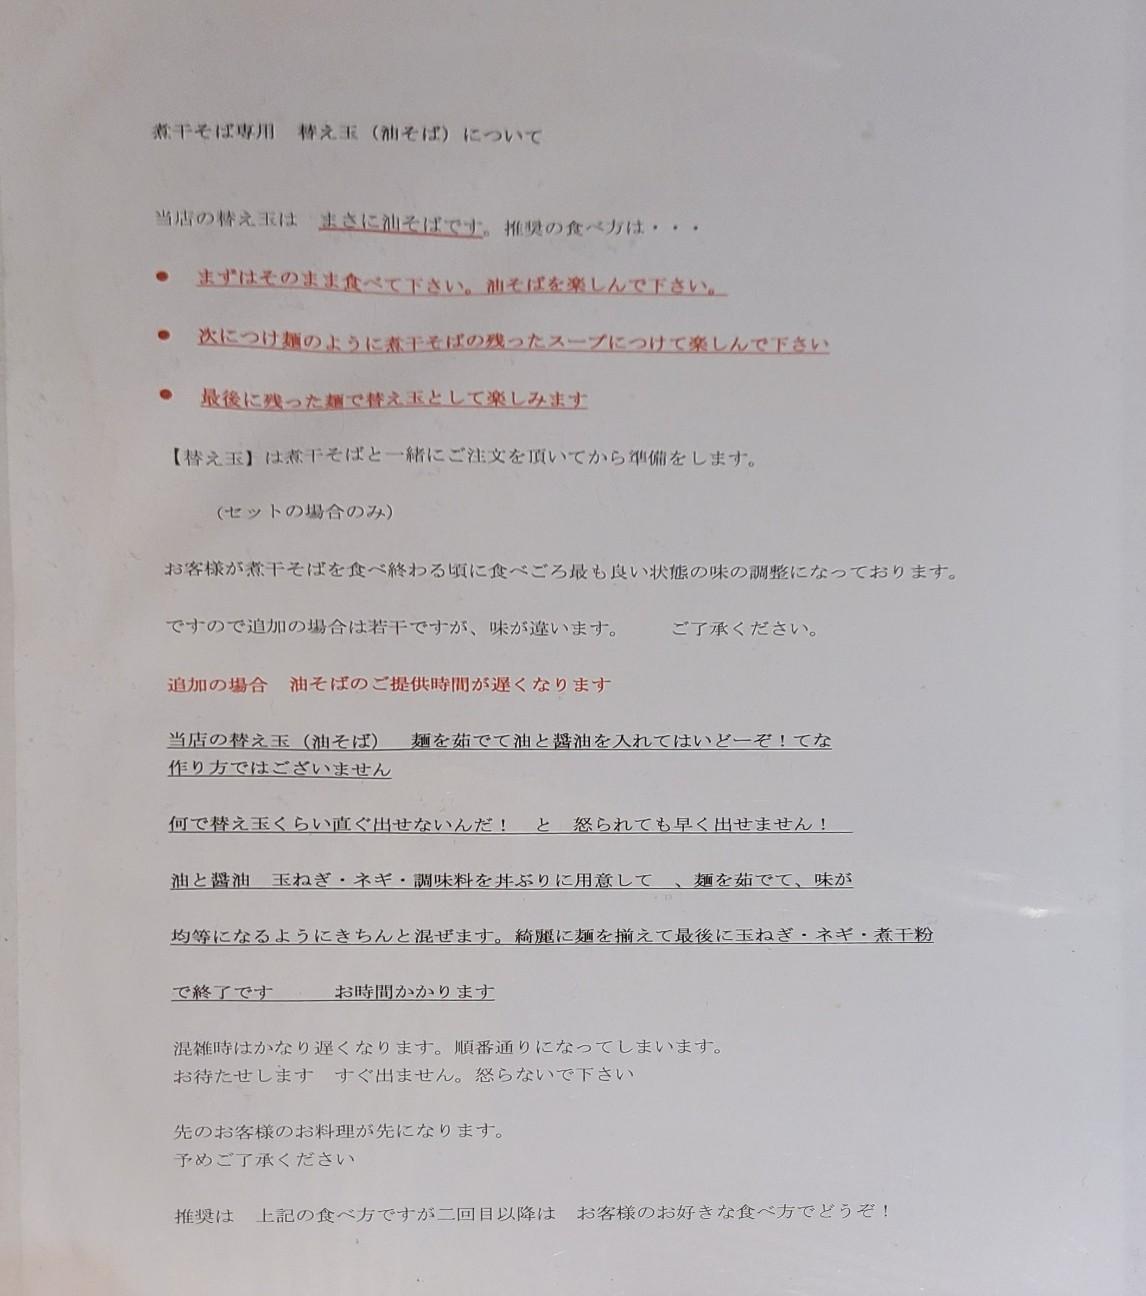 f:id:tt-suzukiit:20210227195050j:image